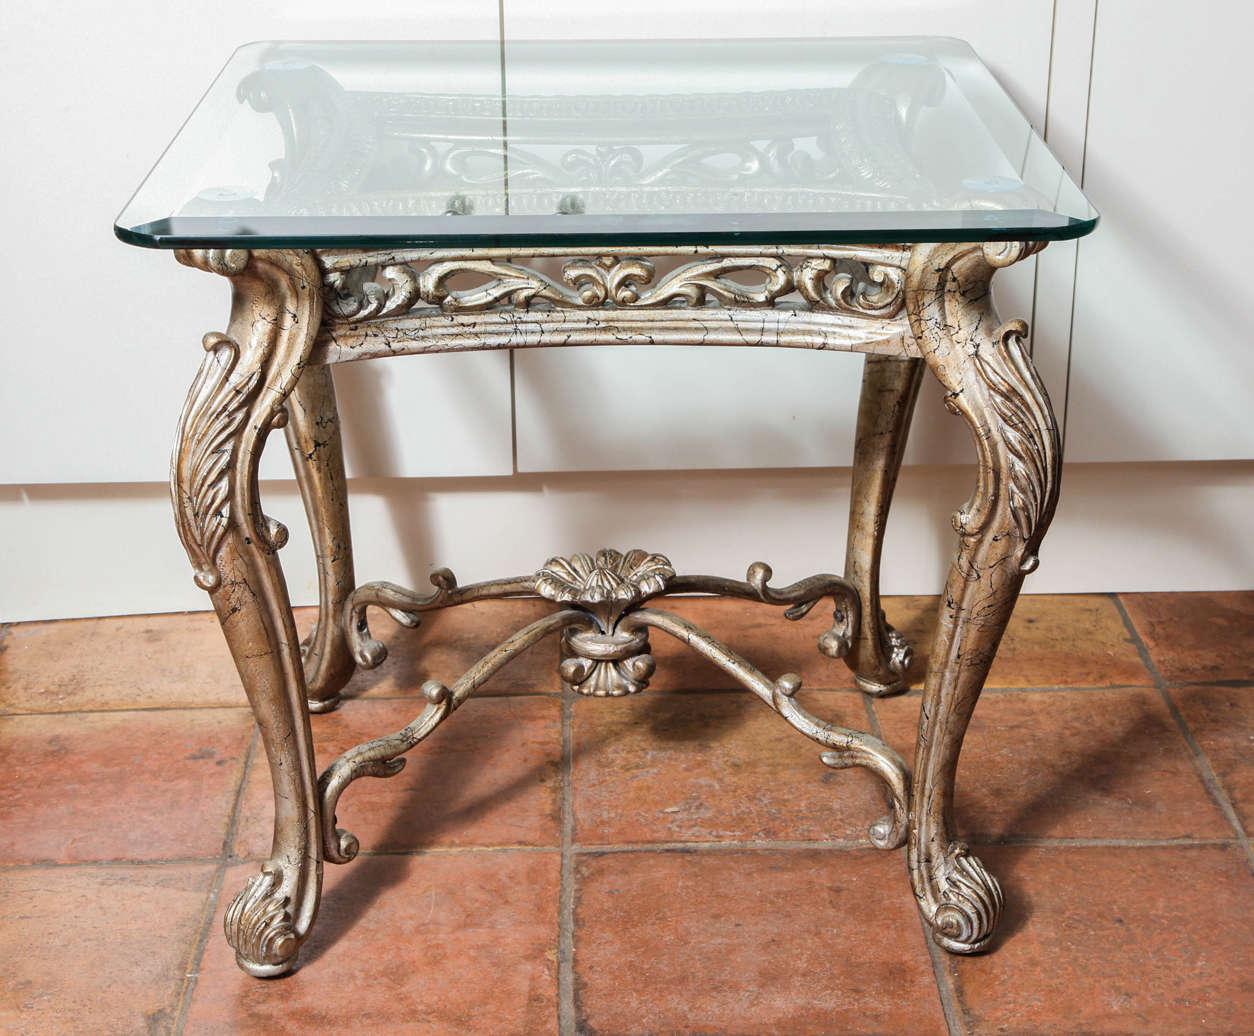 Antique square side table - Antique Italian Rococo Gilt Silver Iron Square Side Table 2